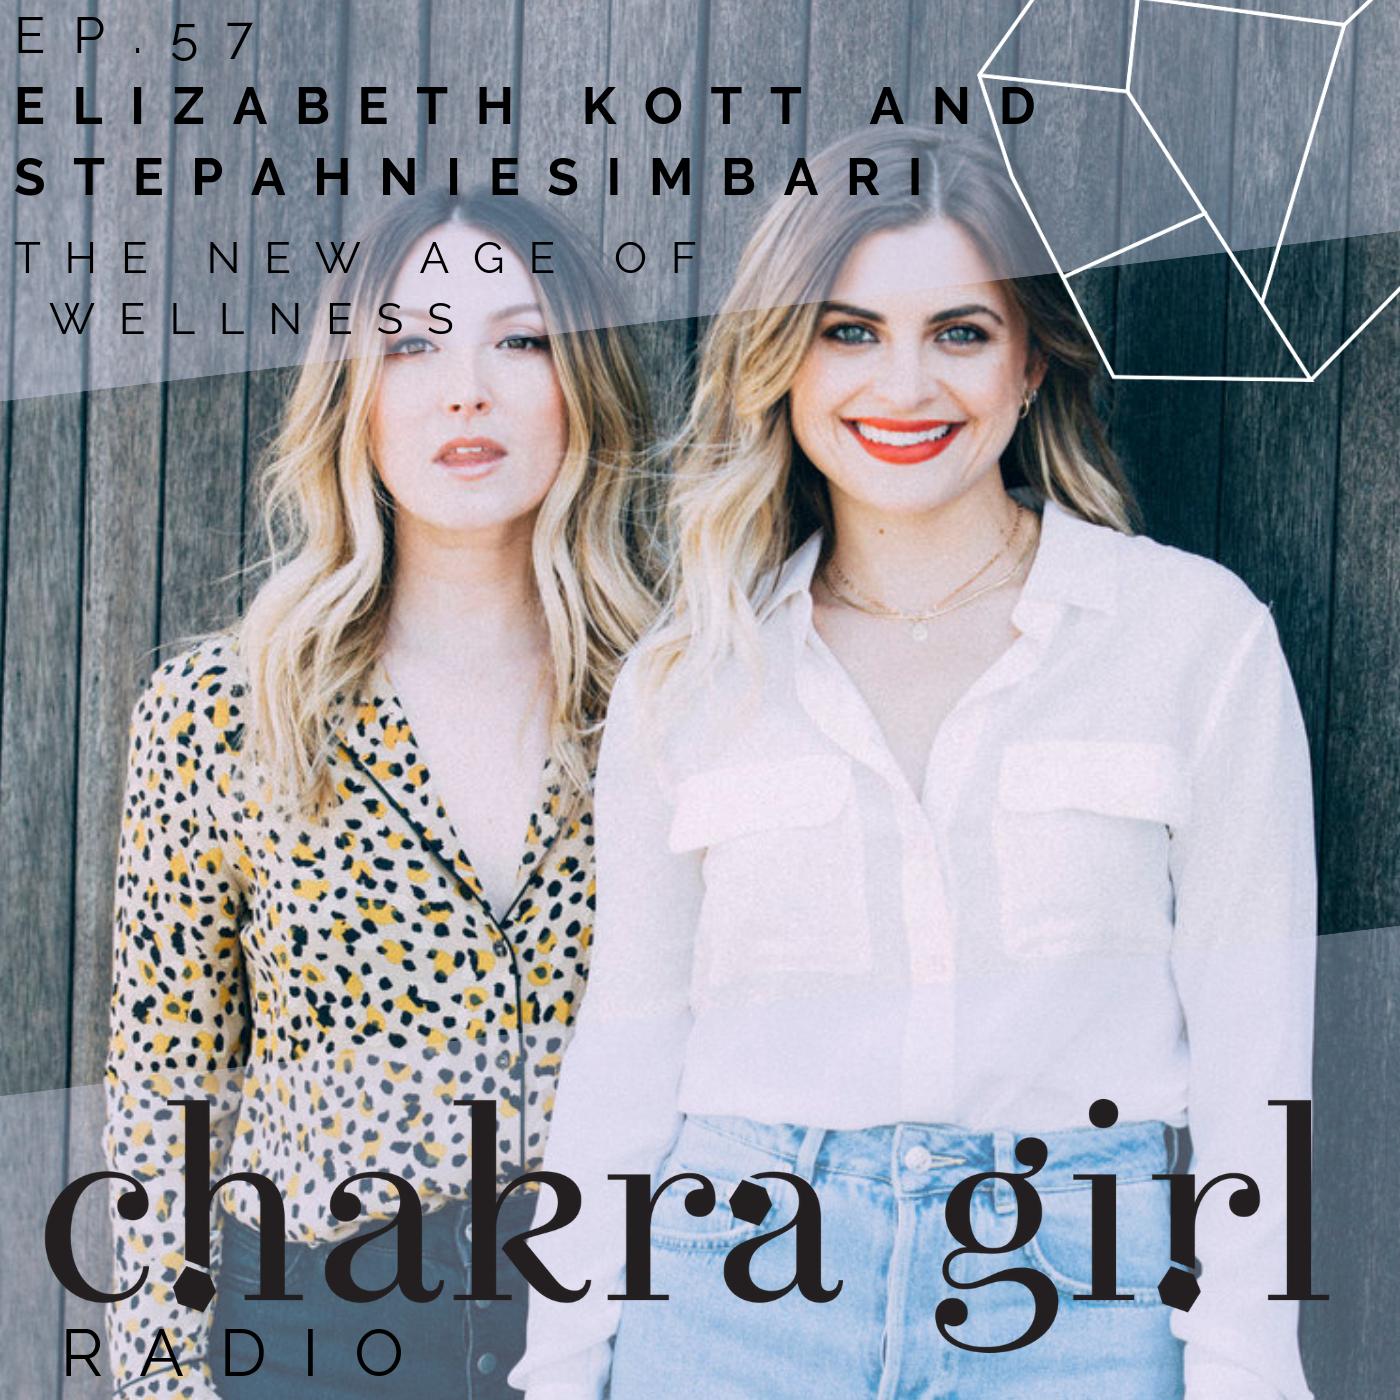 Elizabeth Kott and Stephanie Simbari CHAKRA GIRL RADIO